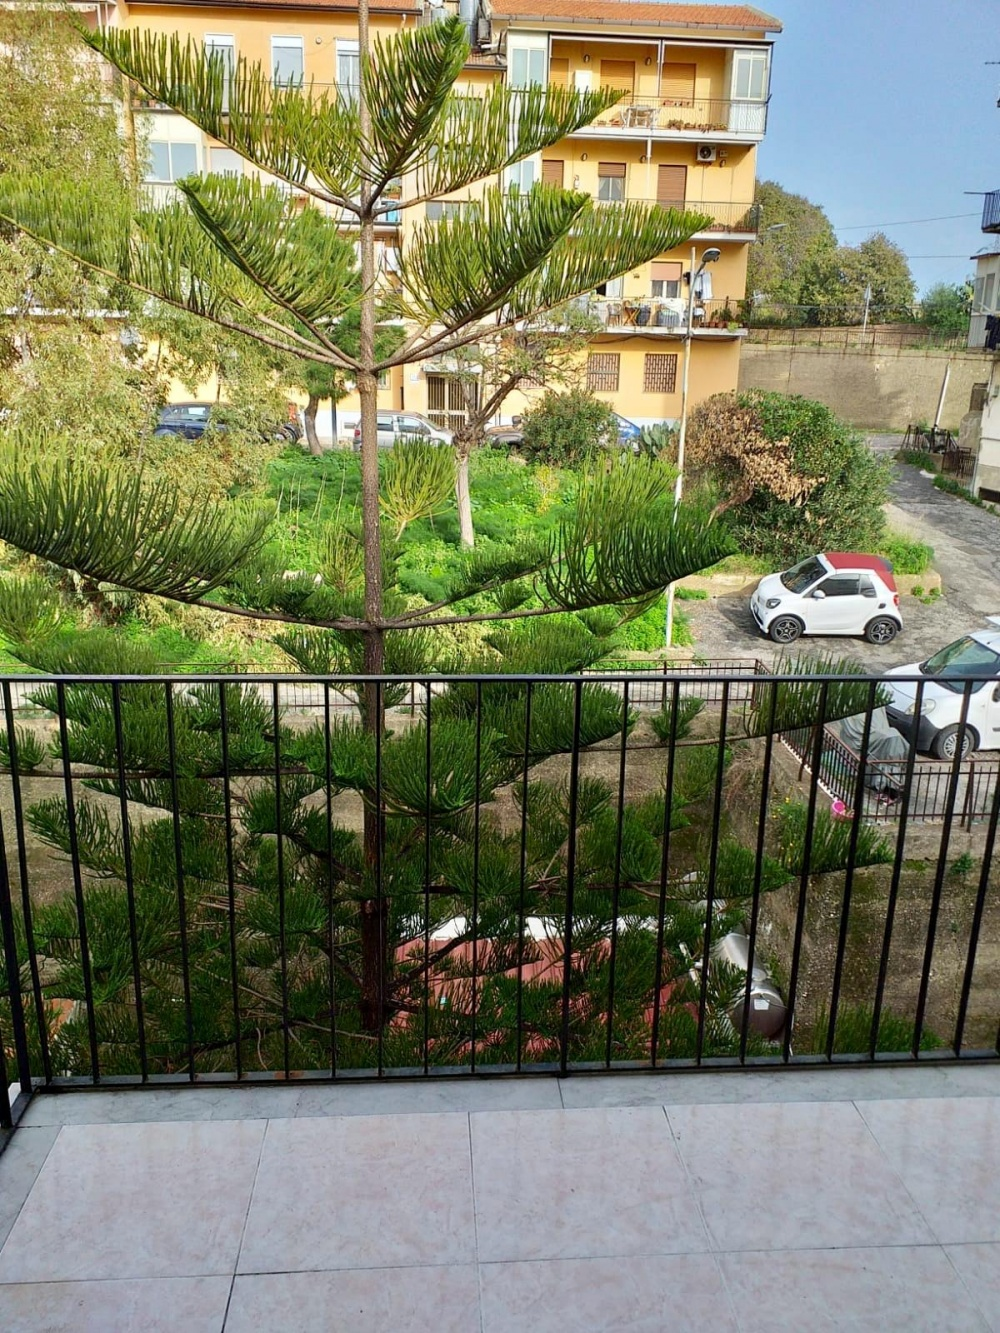 vendita di ville con giardino a Messina